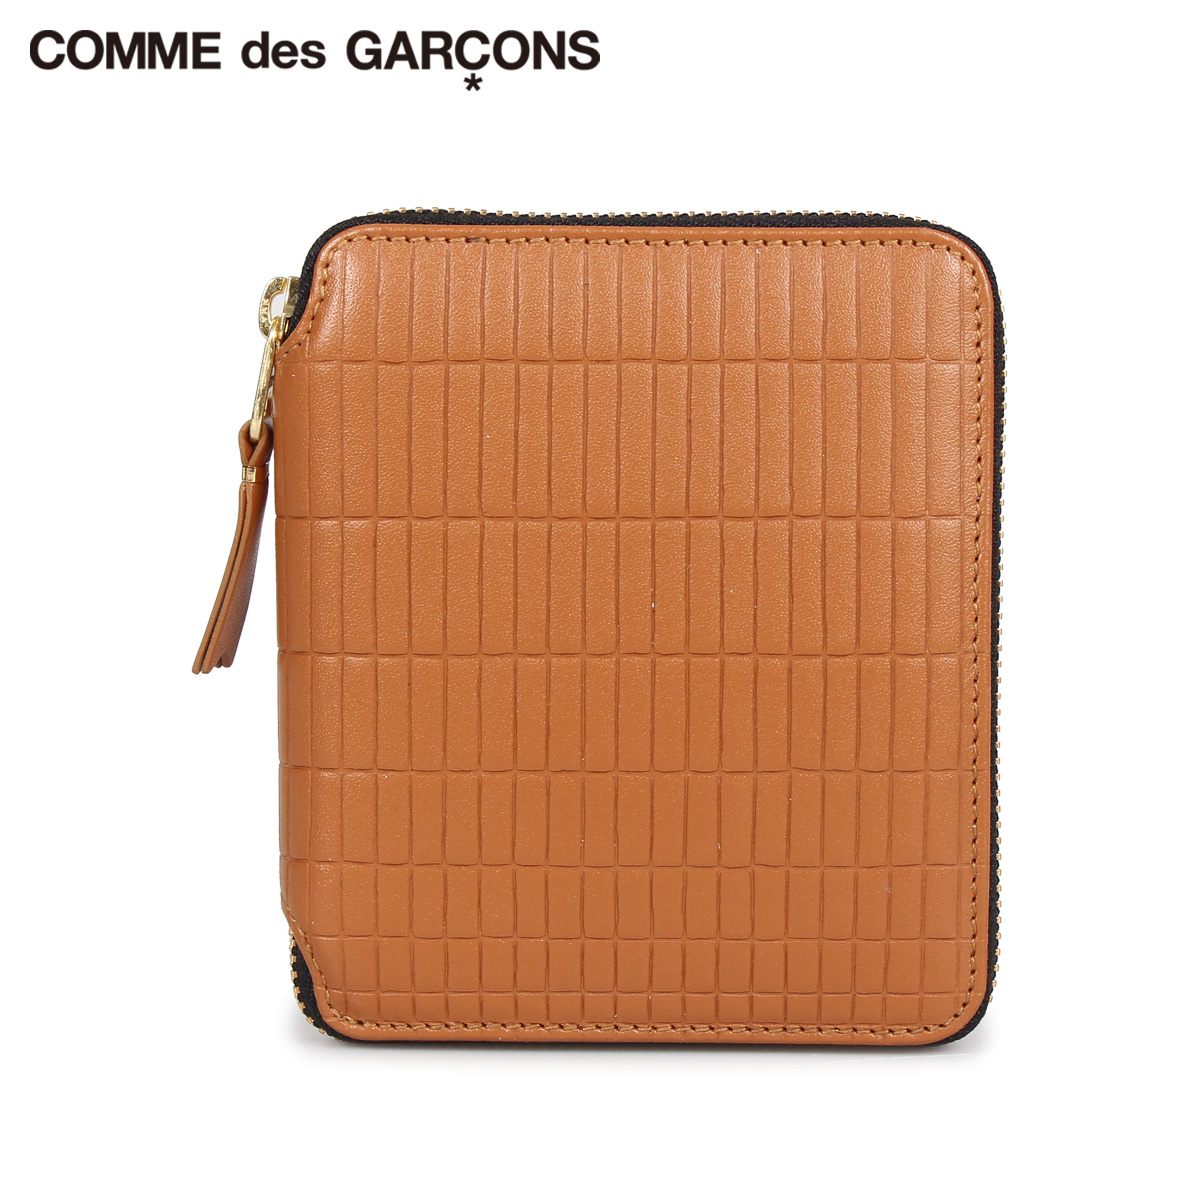 COMME des GARCONS BRICK WALLET コムデギャルソン 財布 二つ折り メンズ レディース ラウンドファスナー 本革 ベージュ SA2100BK